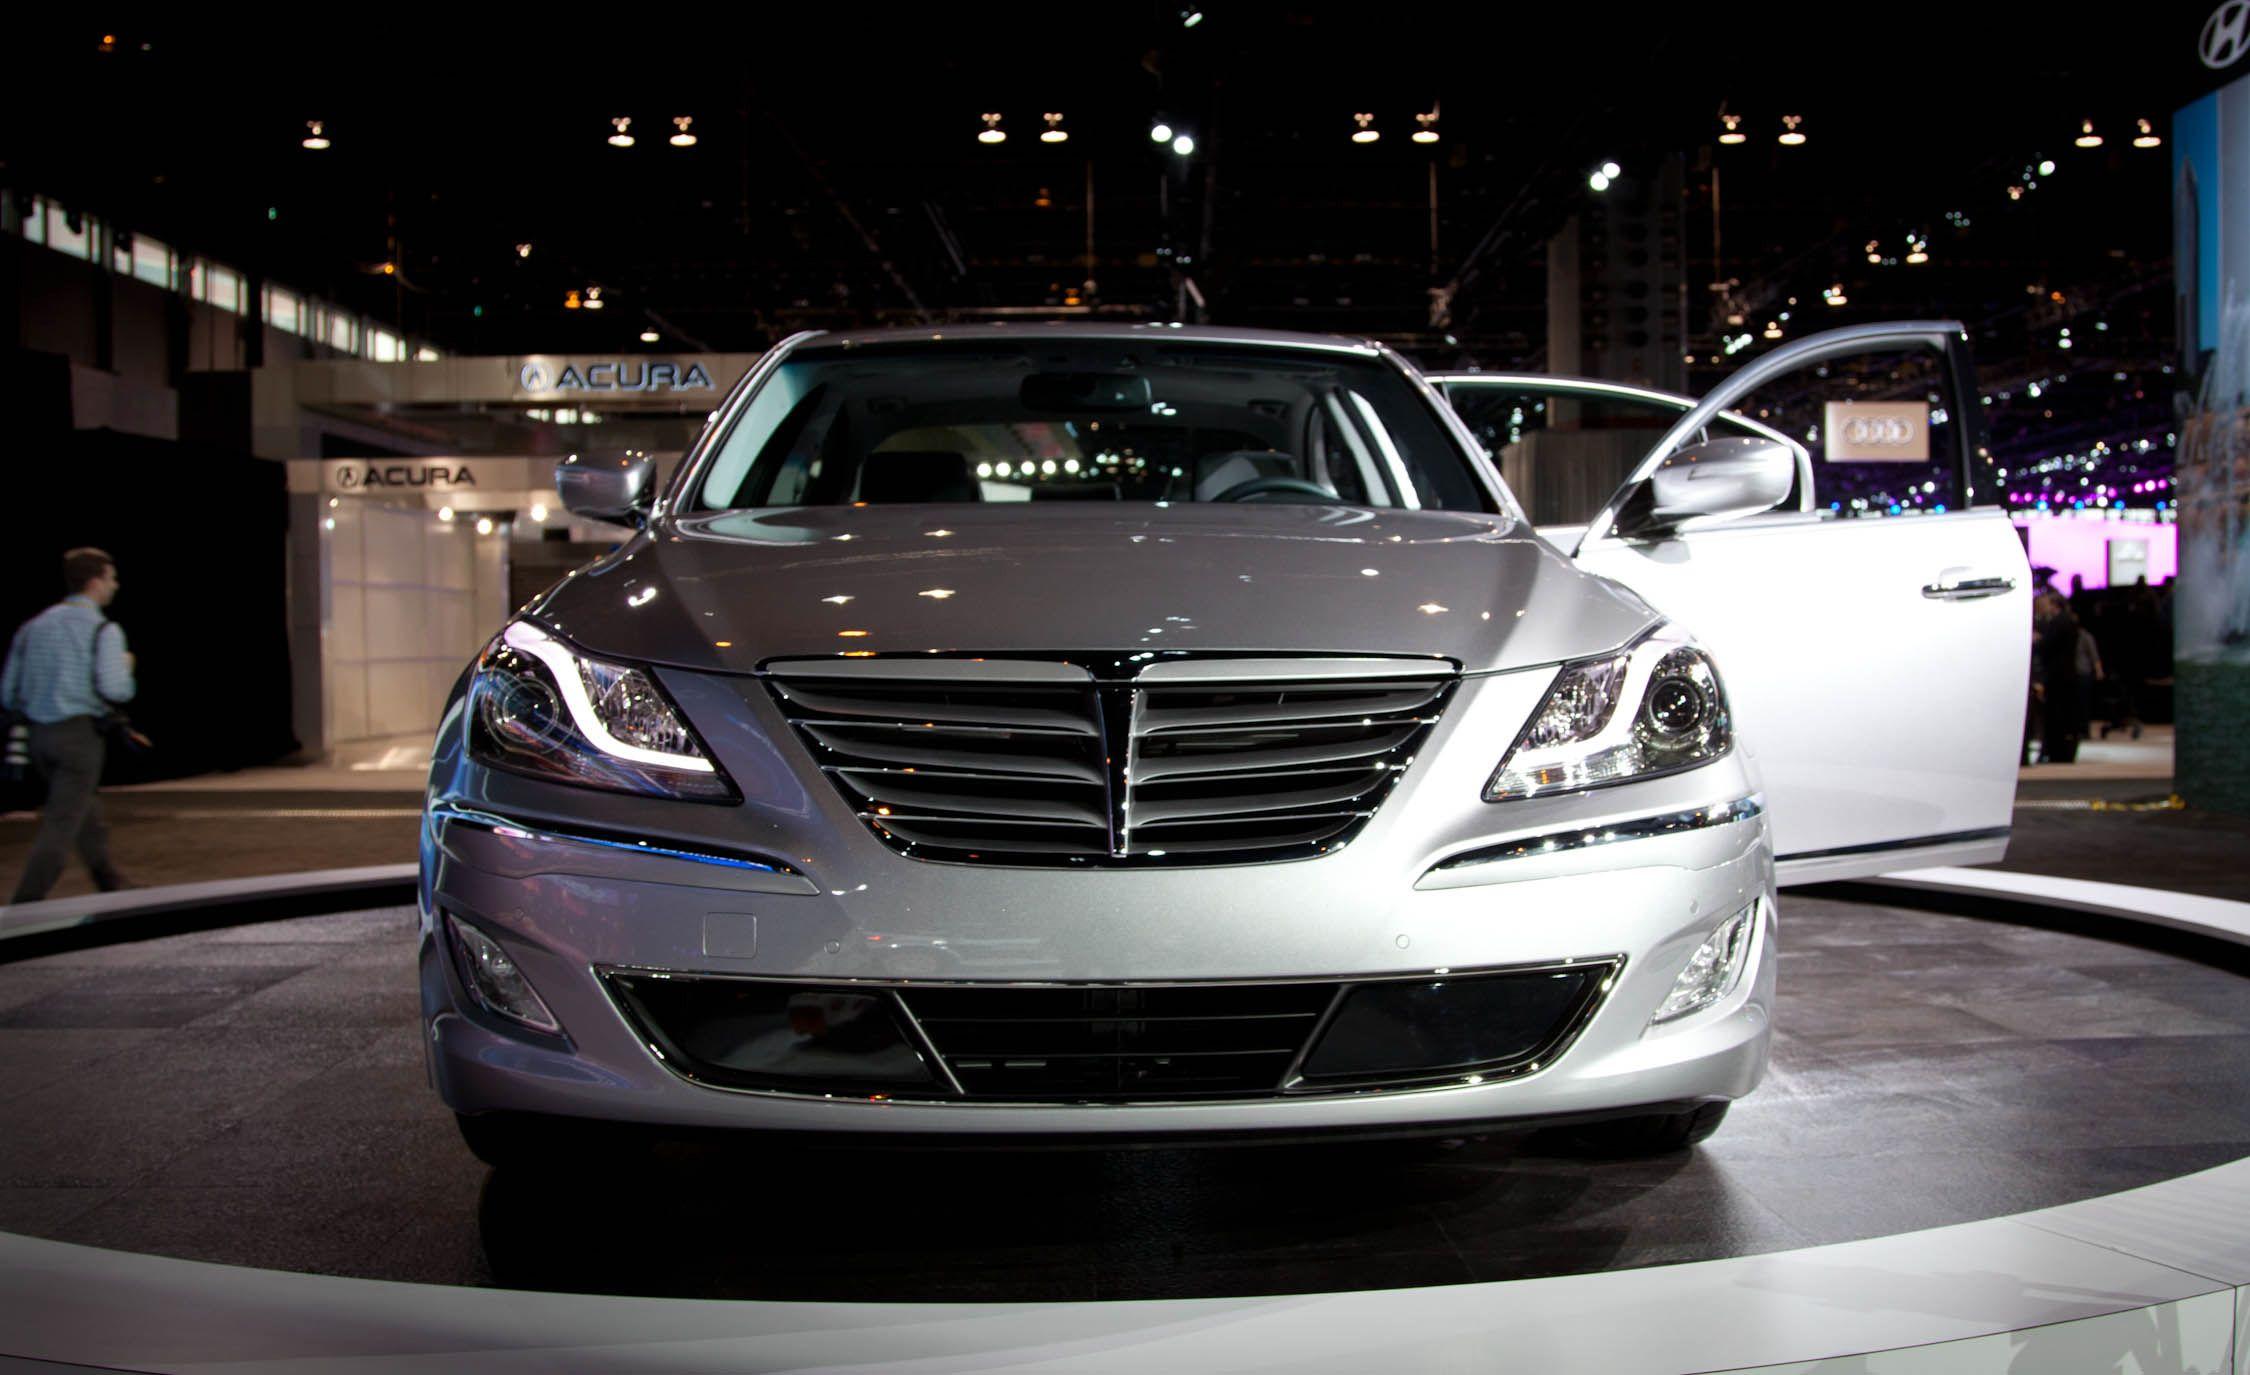 2012 Hyundai Genesis / Genesis 5.0 R Spec Official Photos And Info